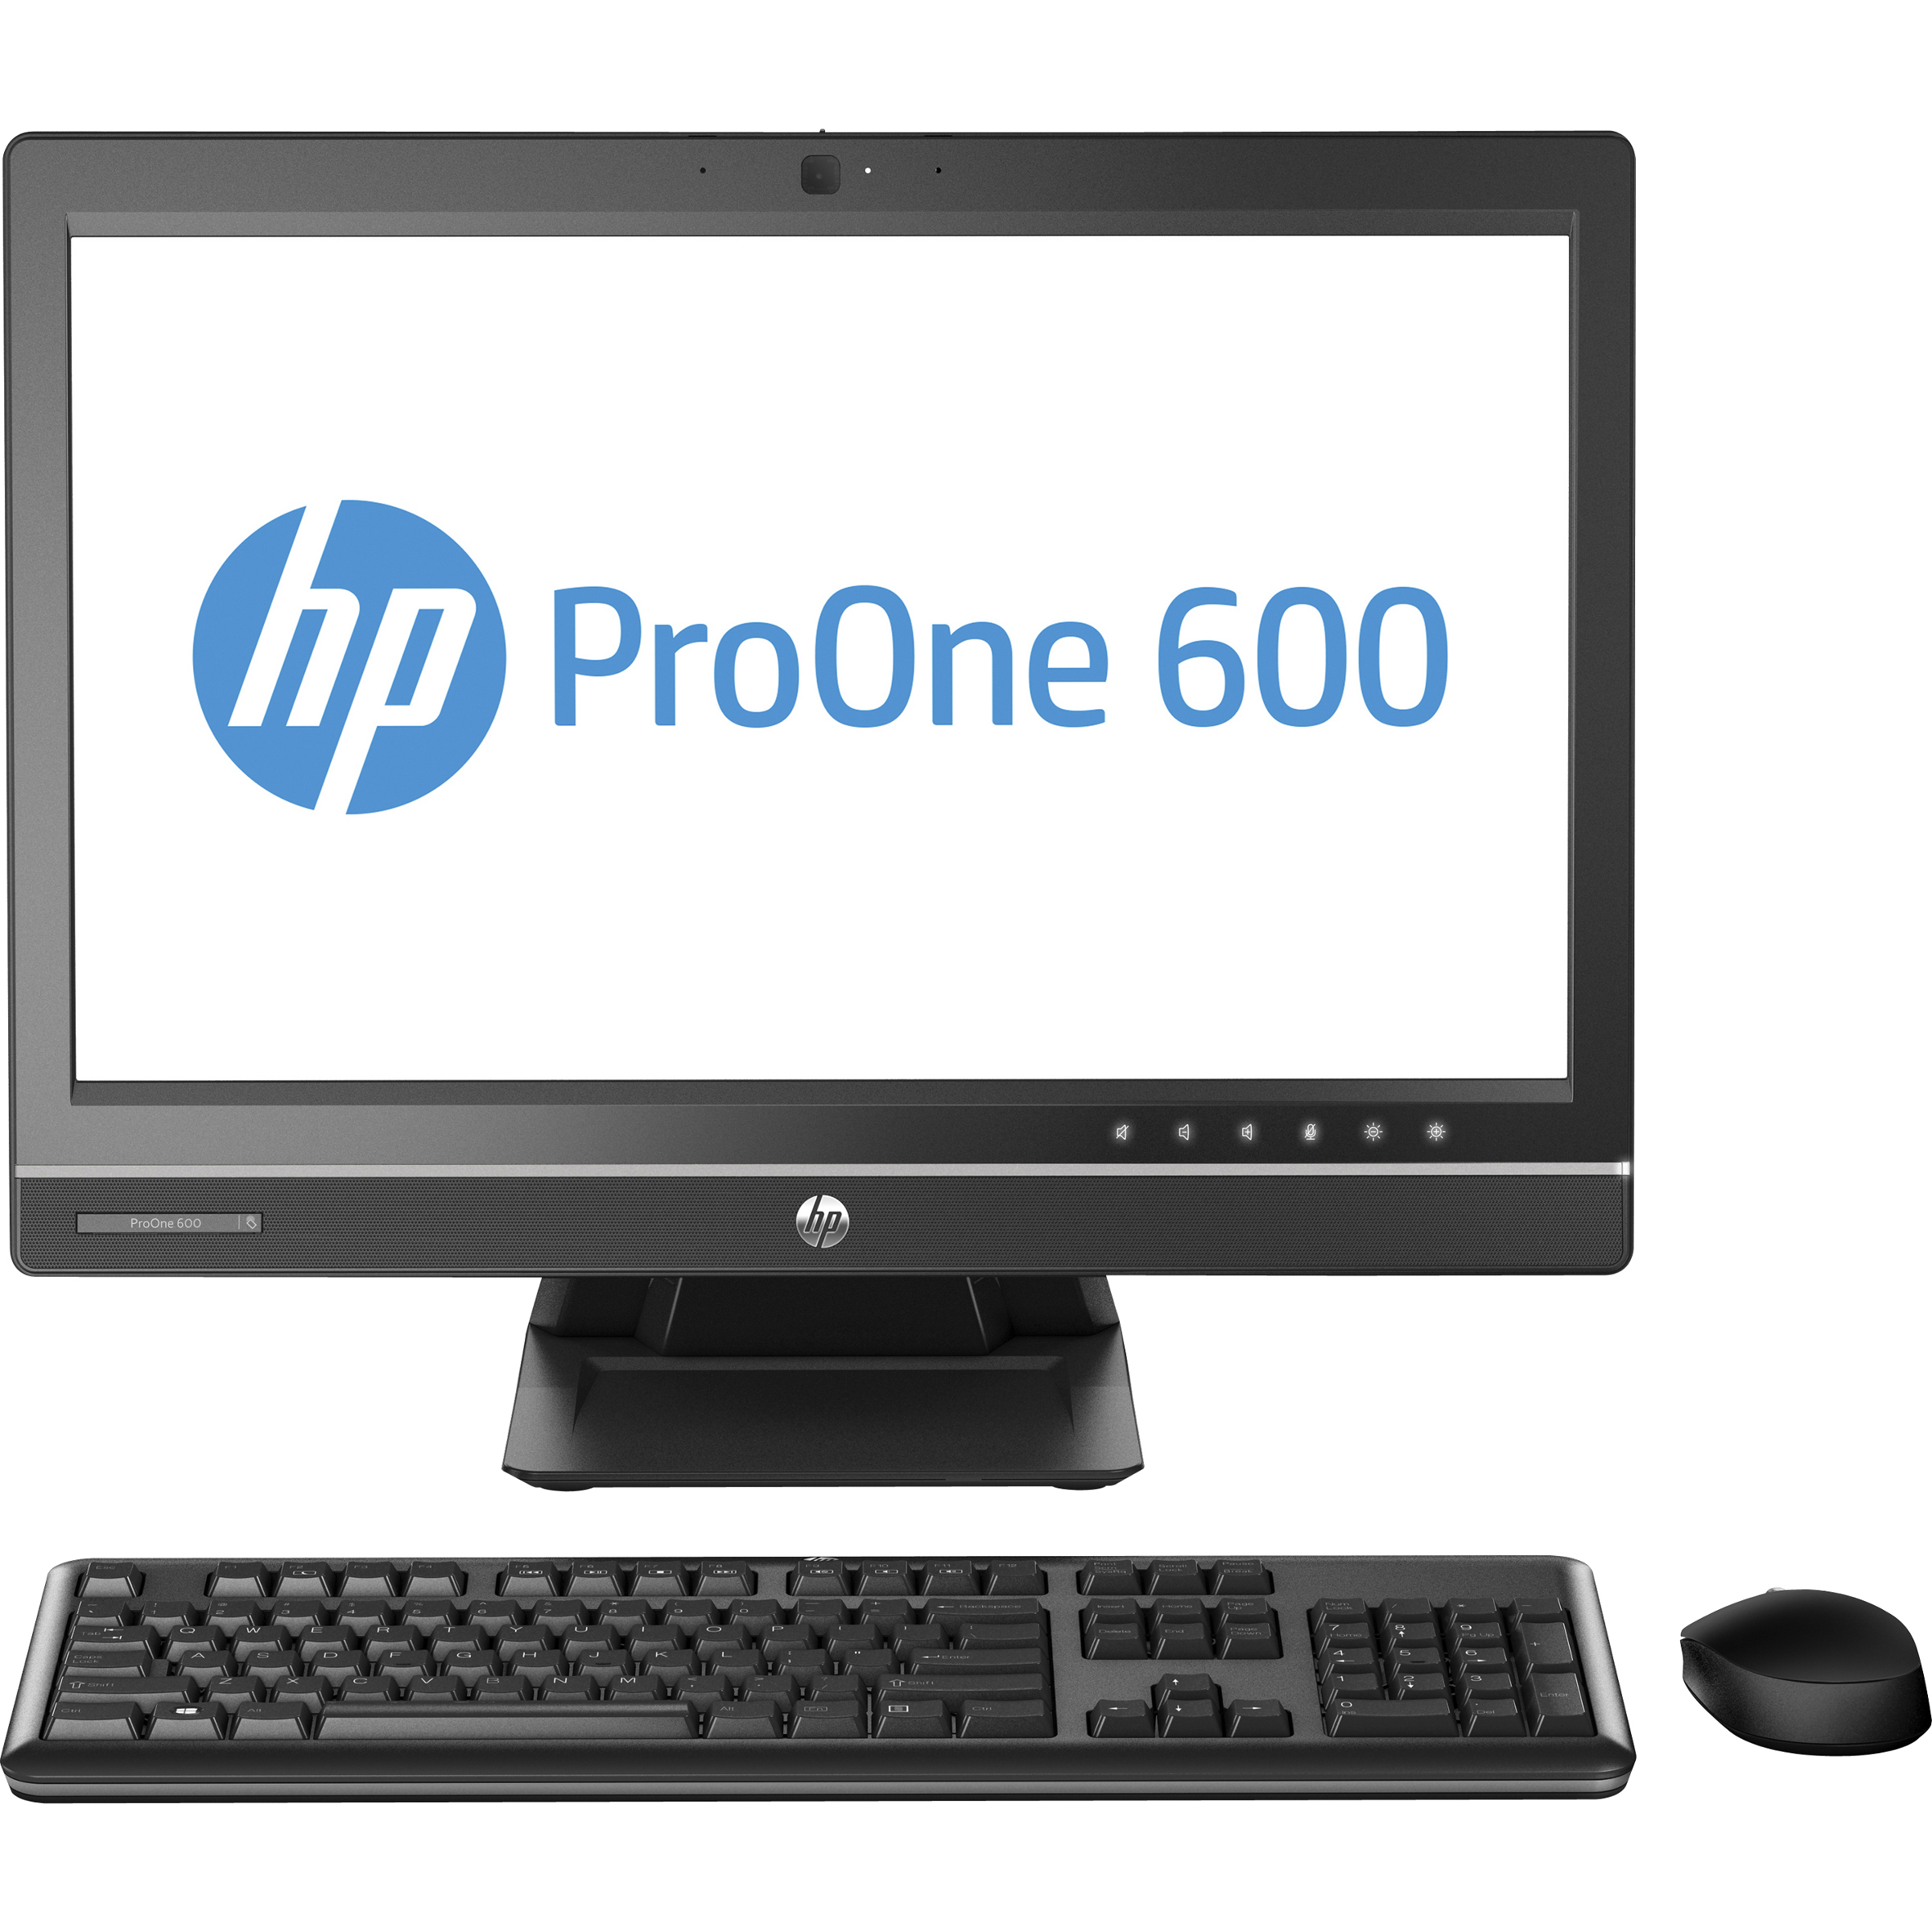 HP Business Desktop ProOne 600 G1 All-in-One Computer - Intel Core i5 i5-4570S 2.90 GHz - Desktop